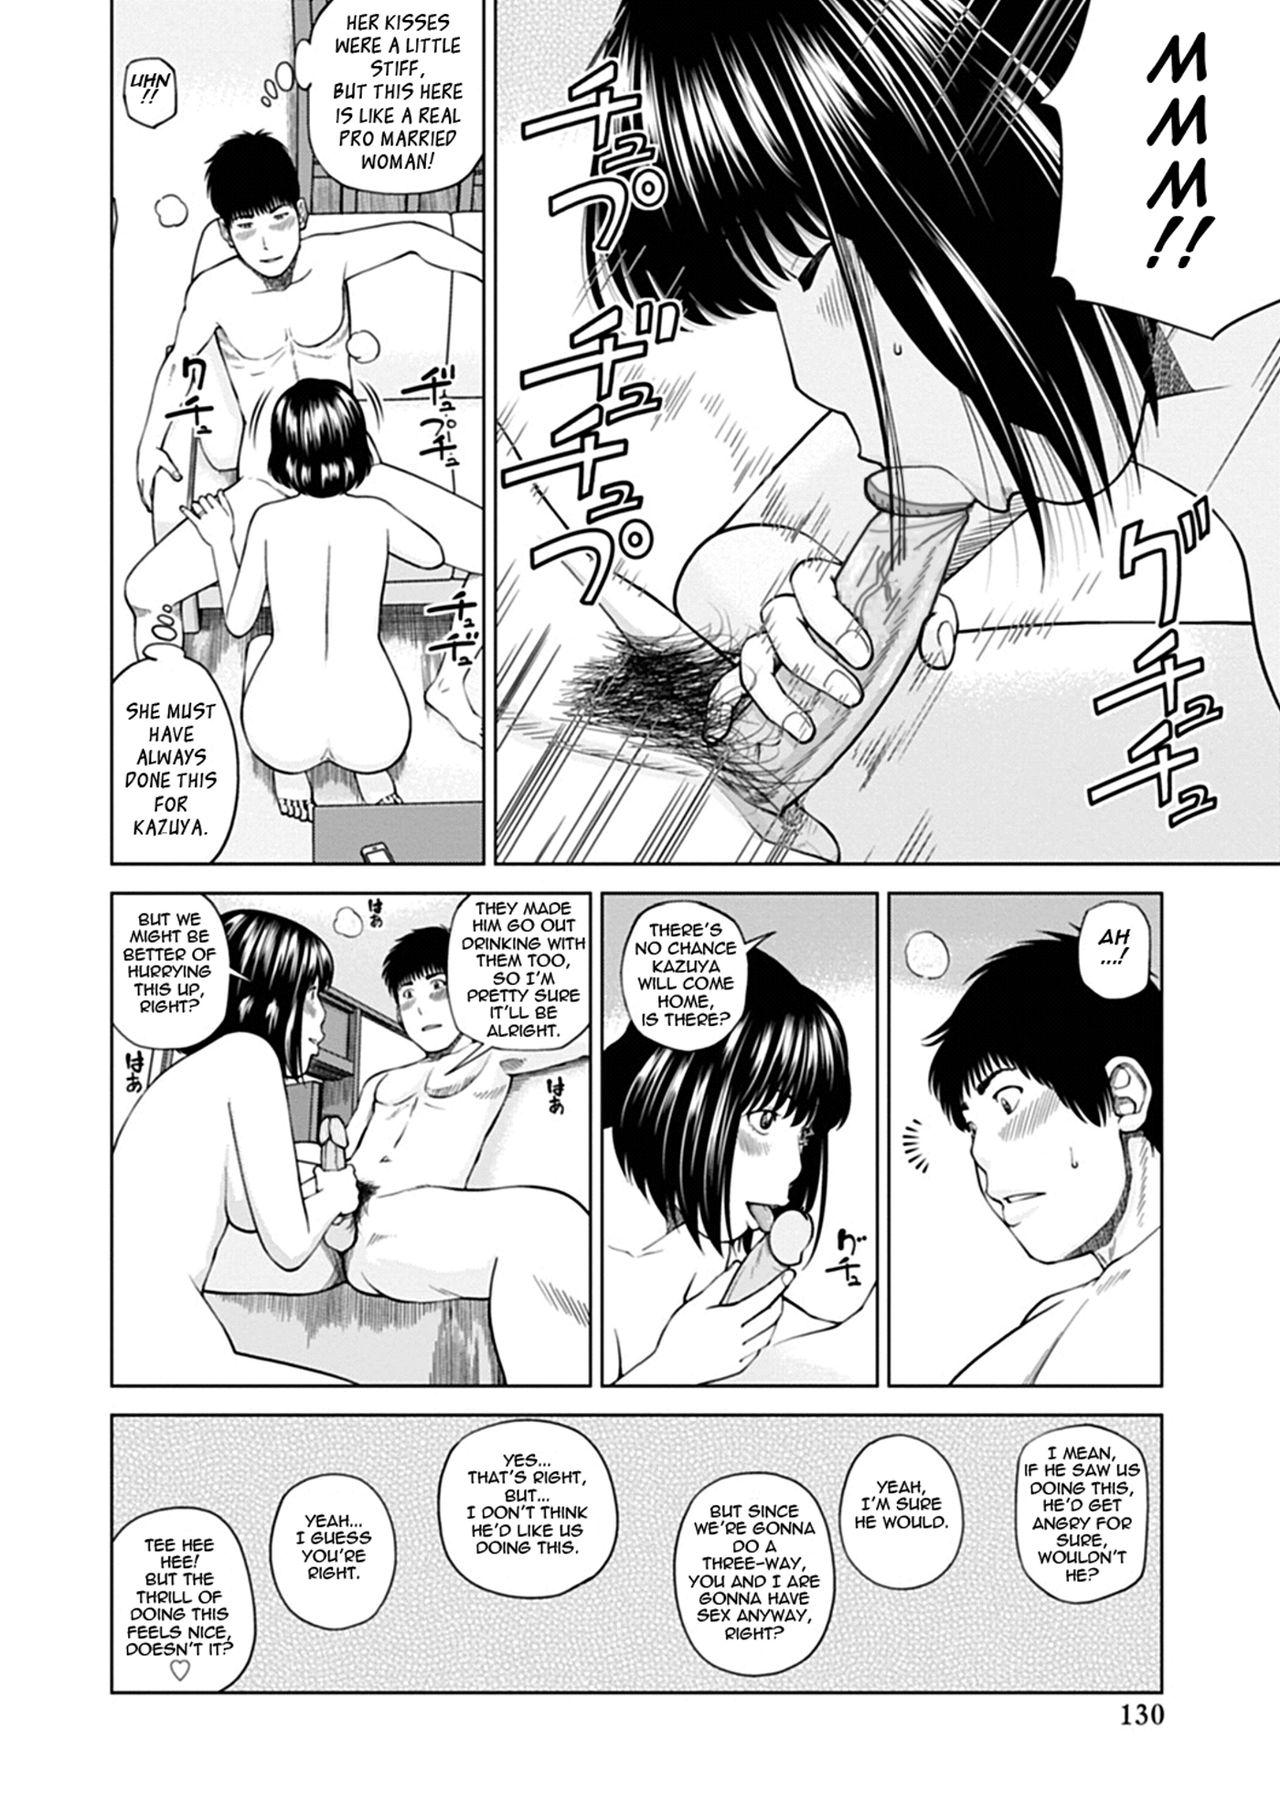 [Kuroki Hidehiko] 36-sai Injuku Sakarizuma | 36-Year-Old Randy Mature Wife [English] {Tadanohito} [Digital] [Uncensored] 125